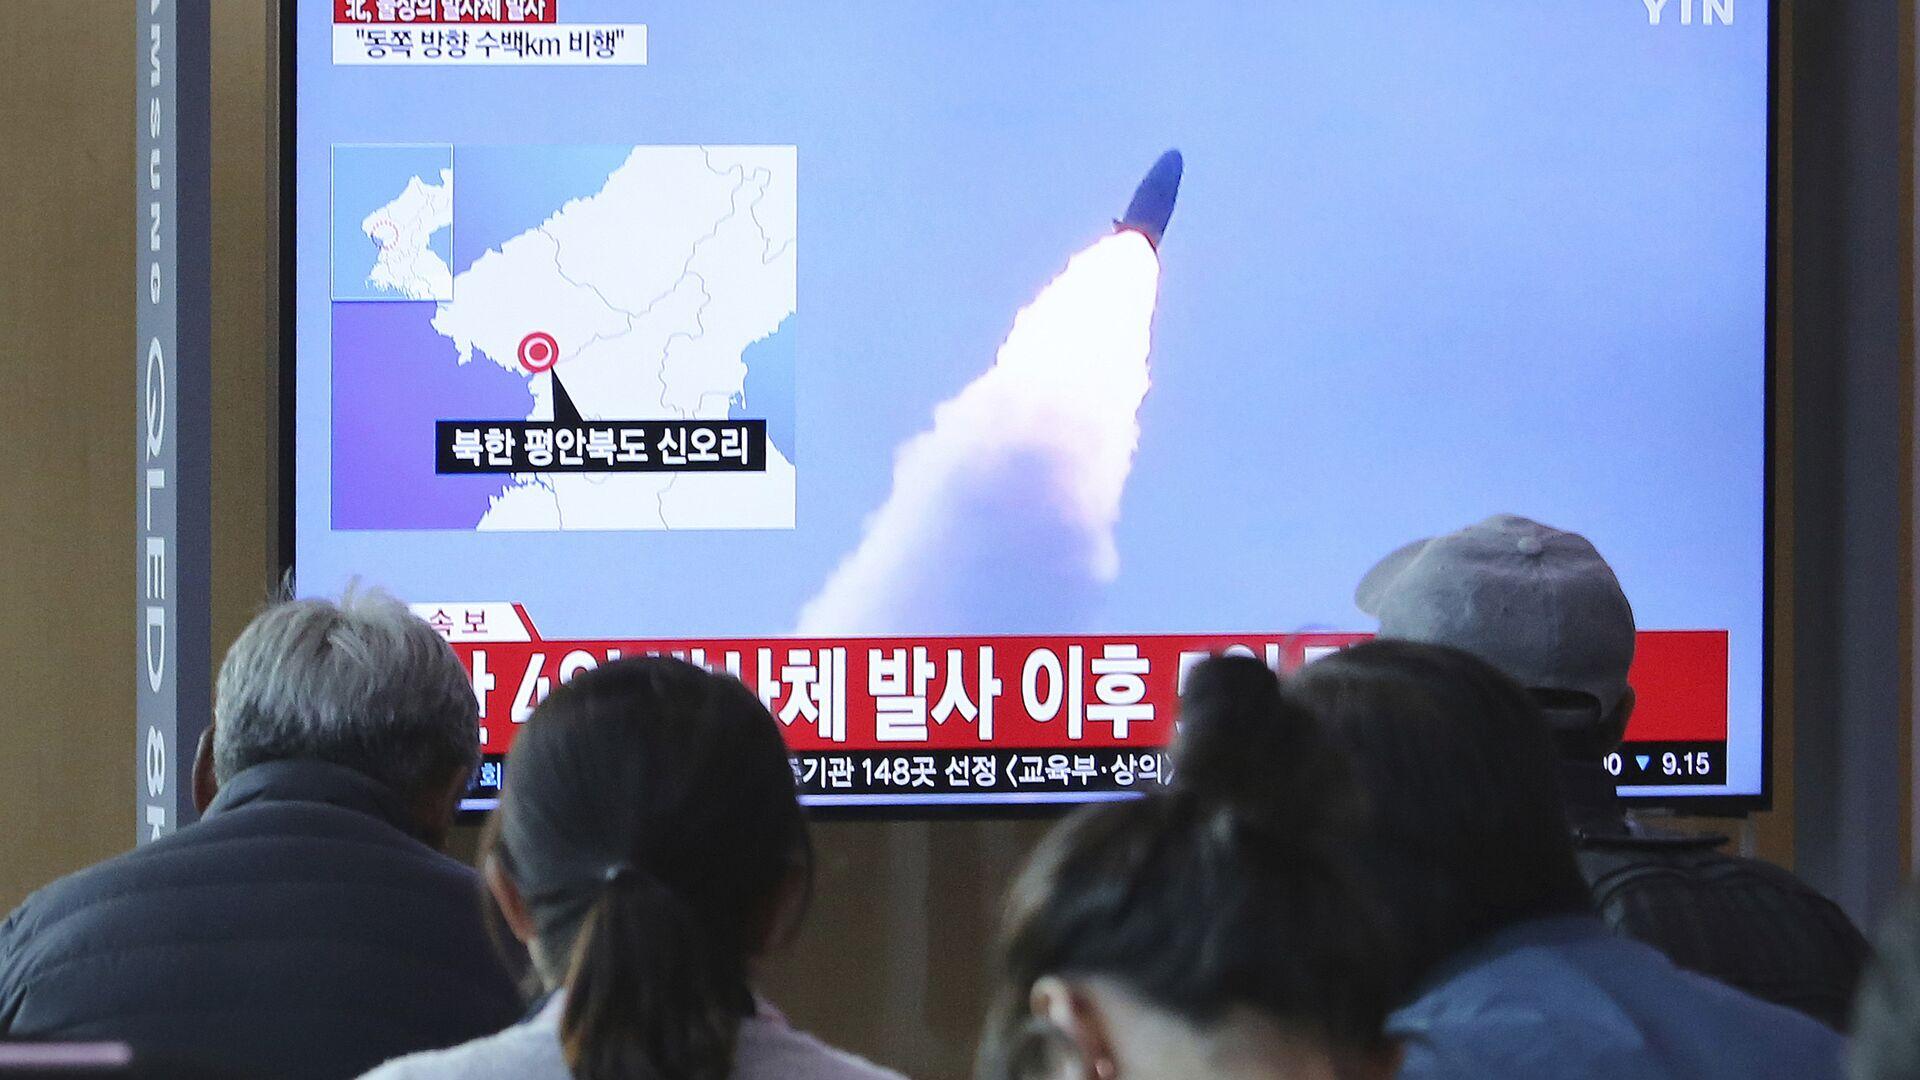 North Korean missile launch - Sputnik International, 1920, 15.09.2021